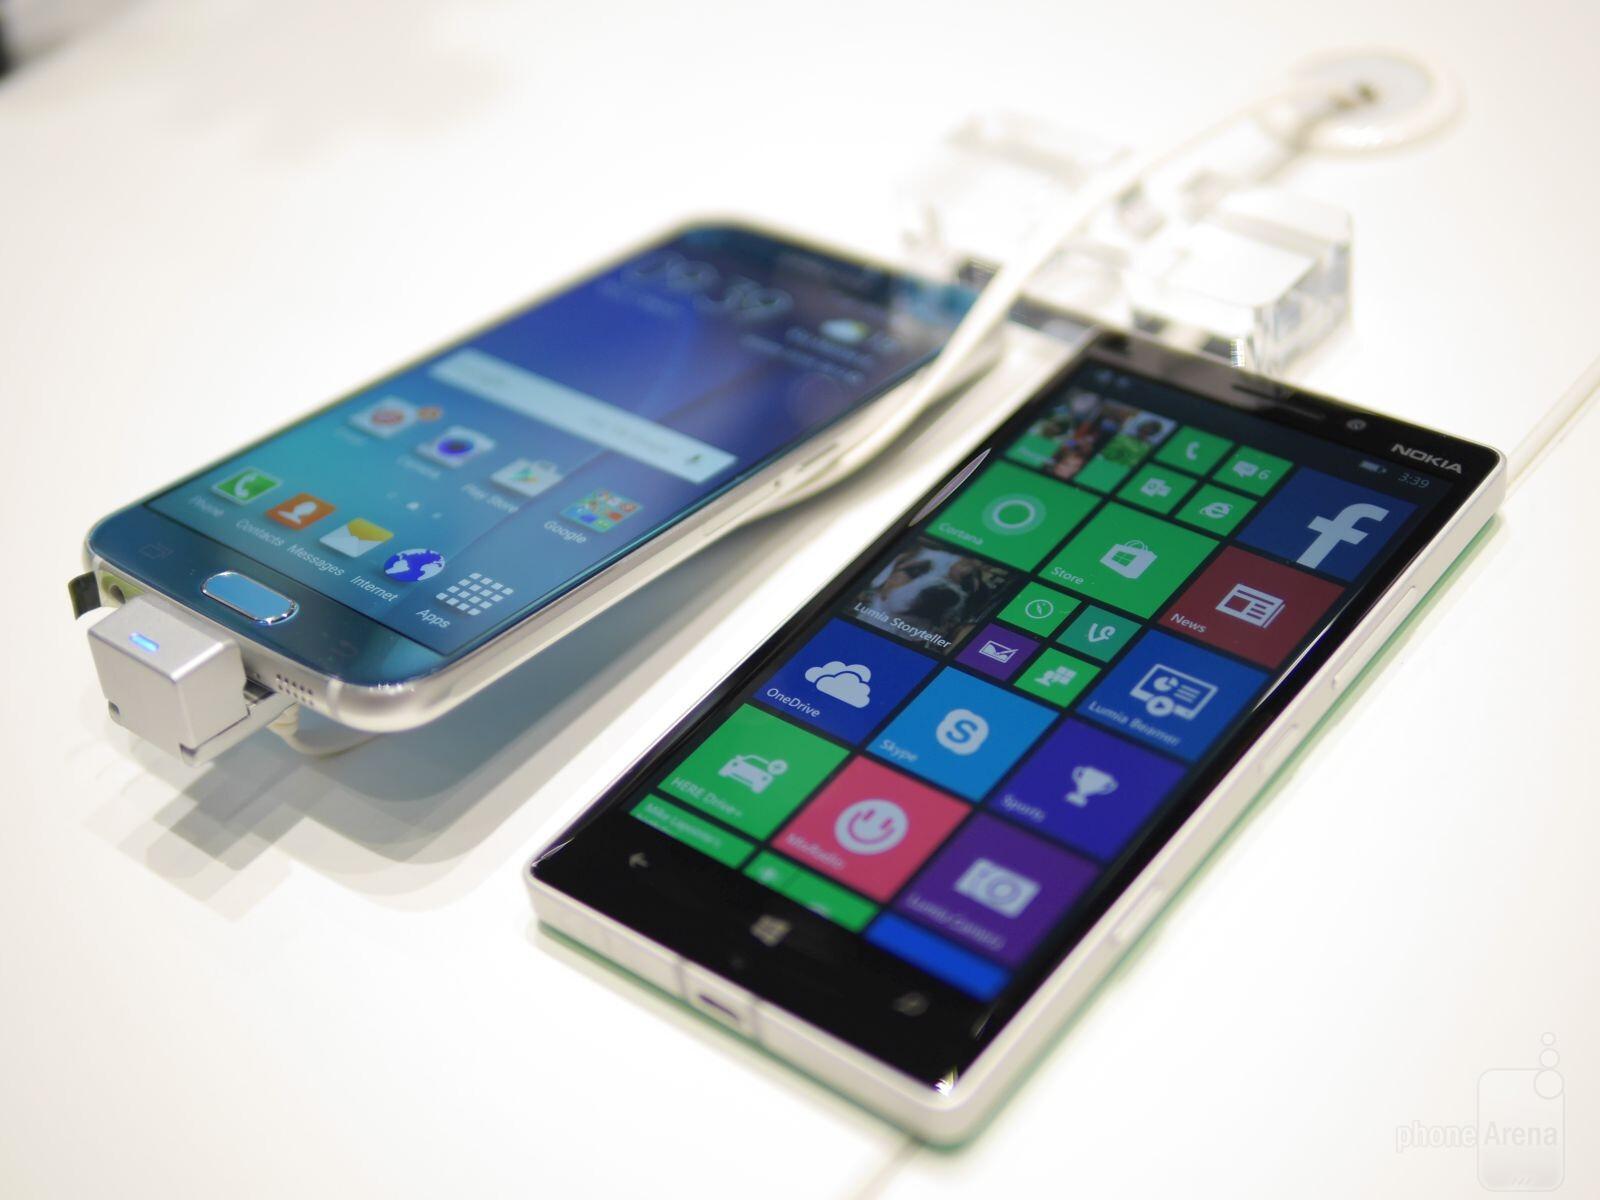 Samsung Galaxy S6 edge vs Nokia C6 01